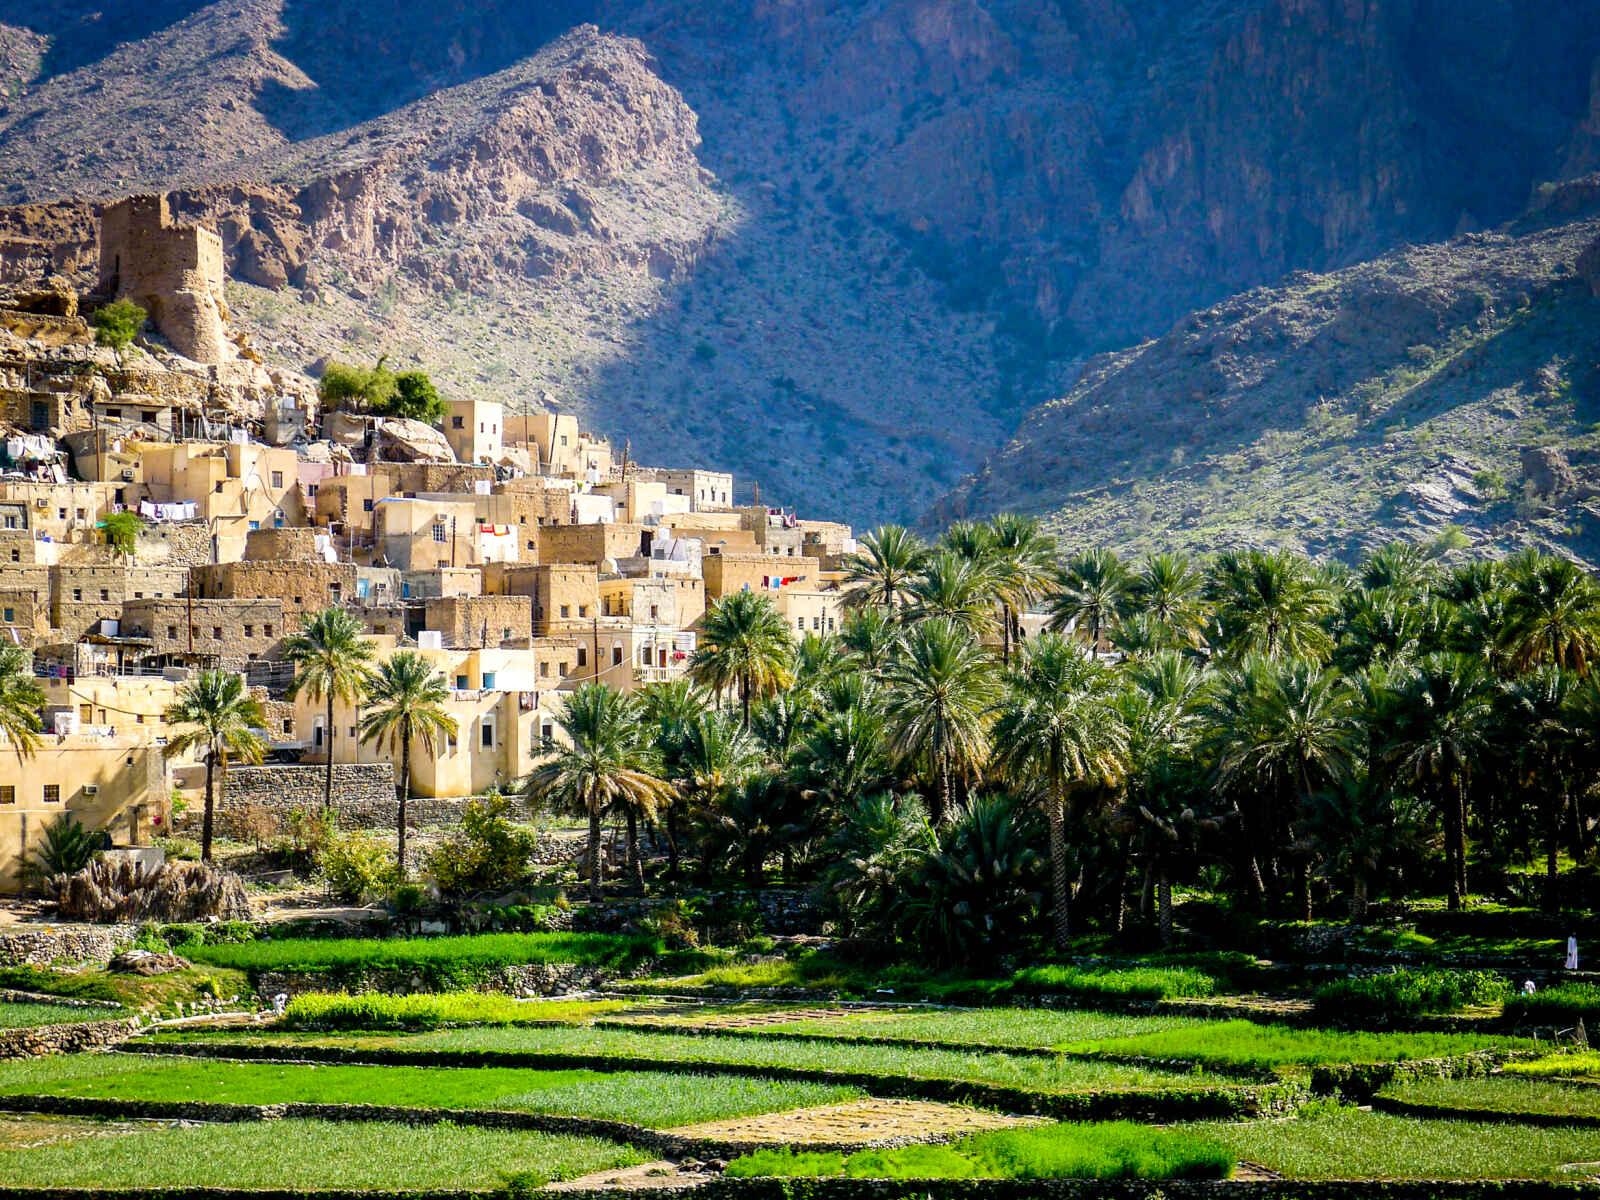 Oman : L'aventure en 4x4 2022